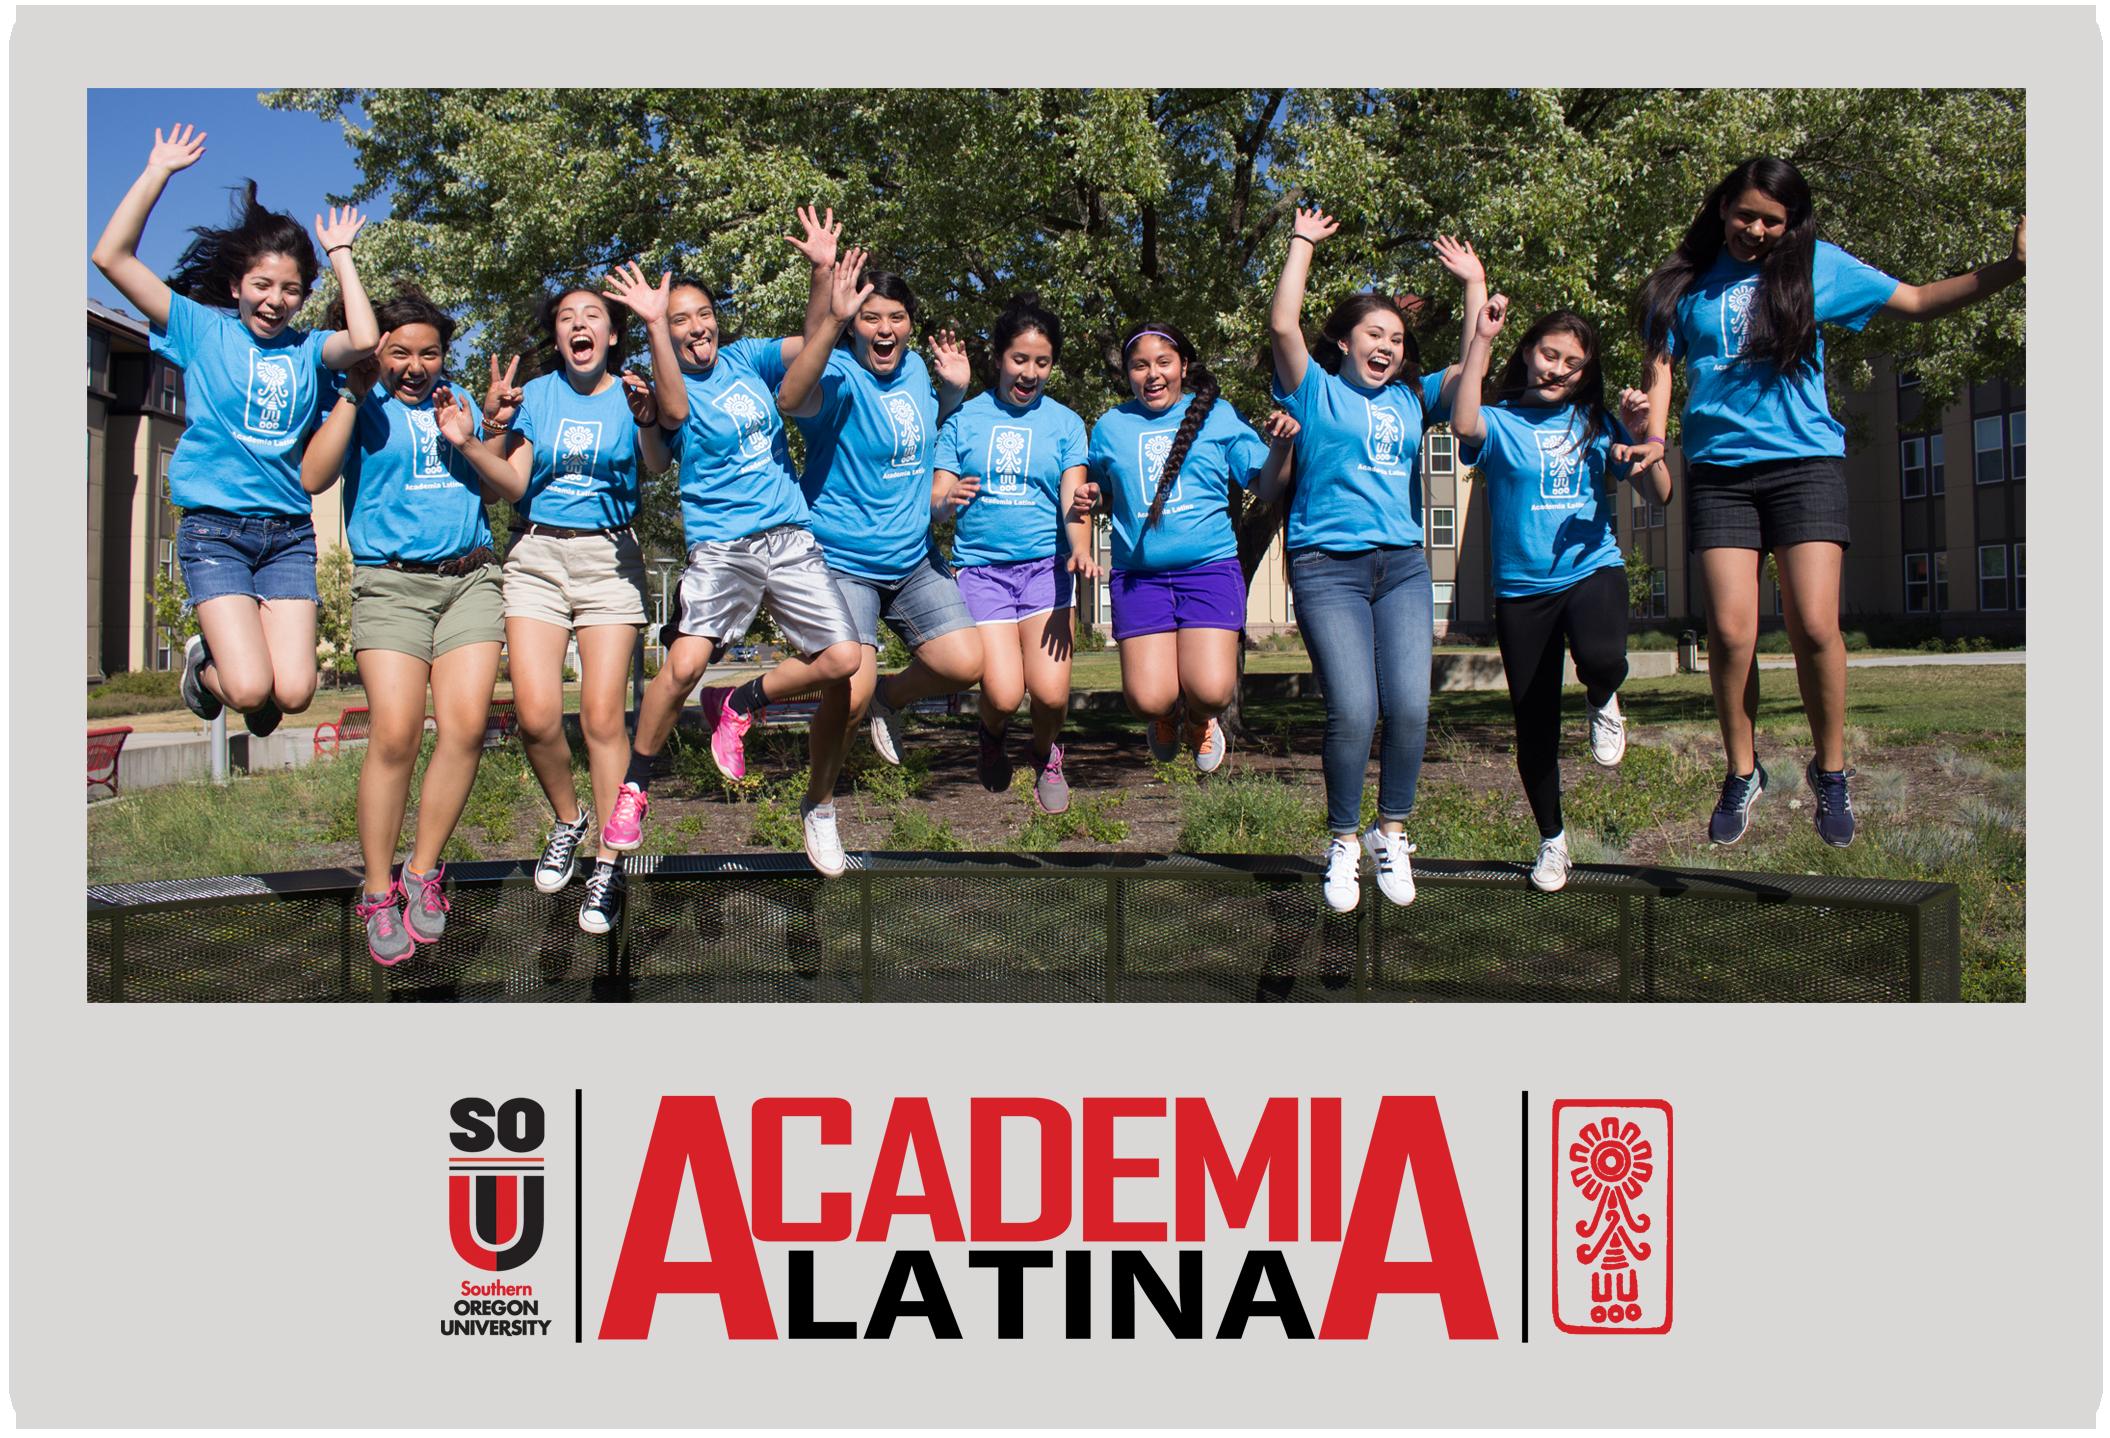 Academia Latina Button for 7th - 9th Grade Students